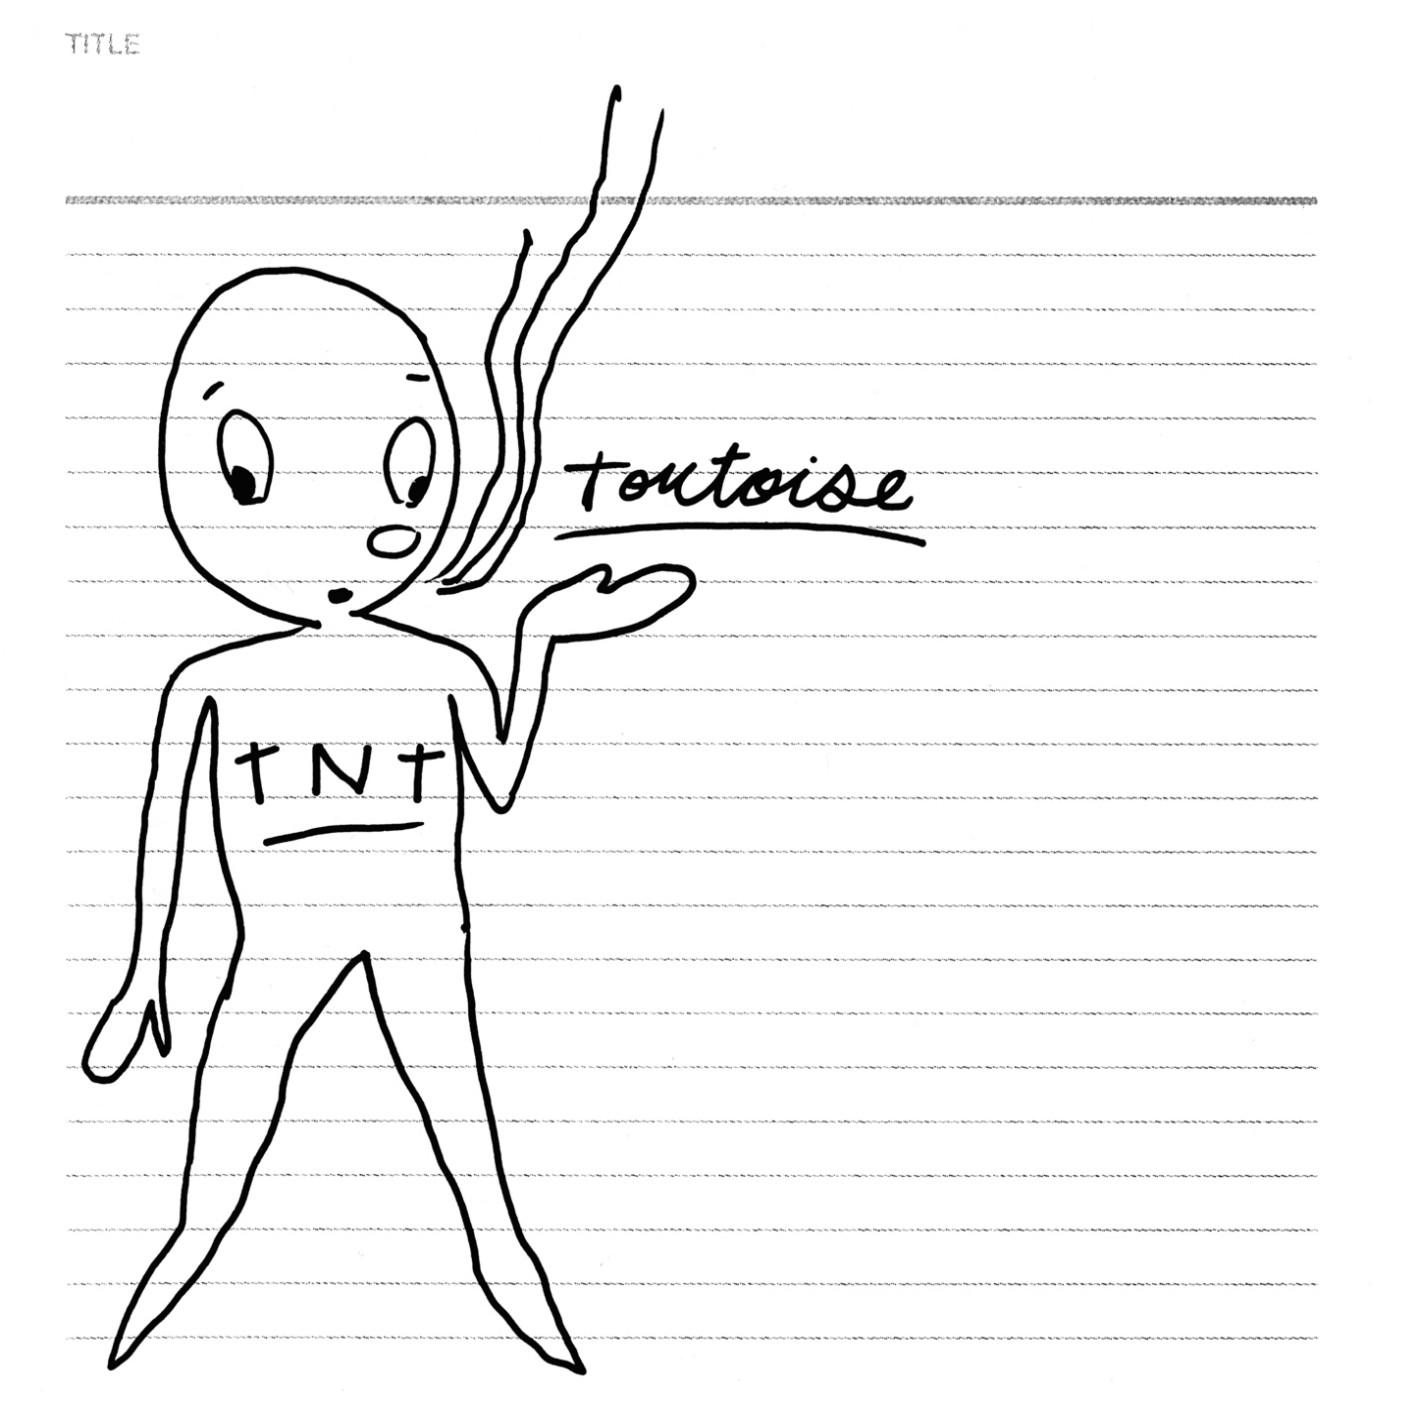 Tortoise — TNT